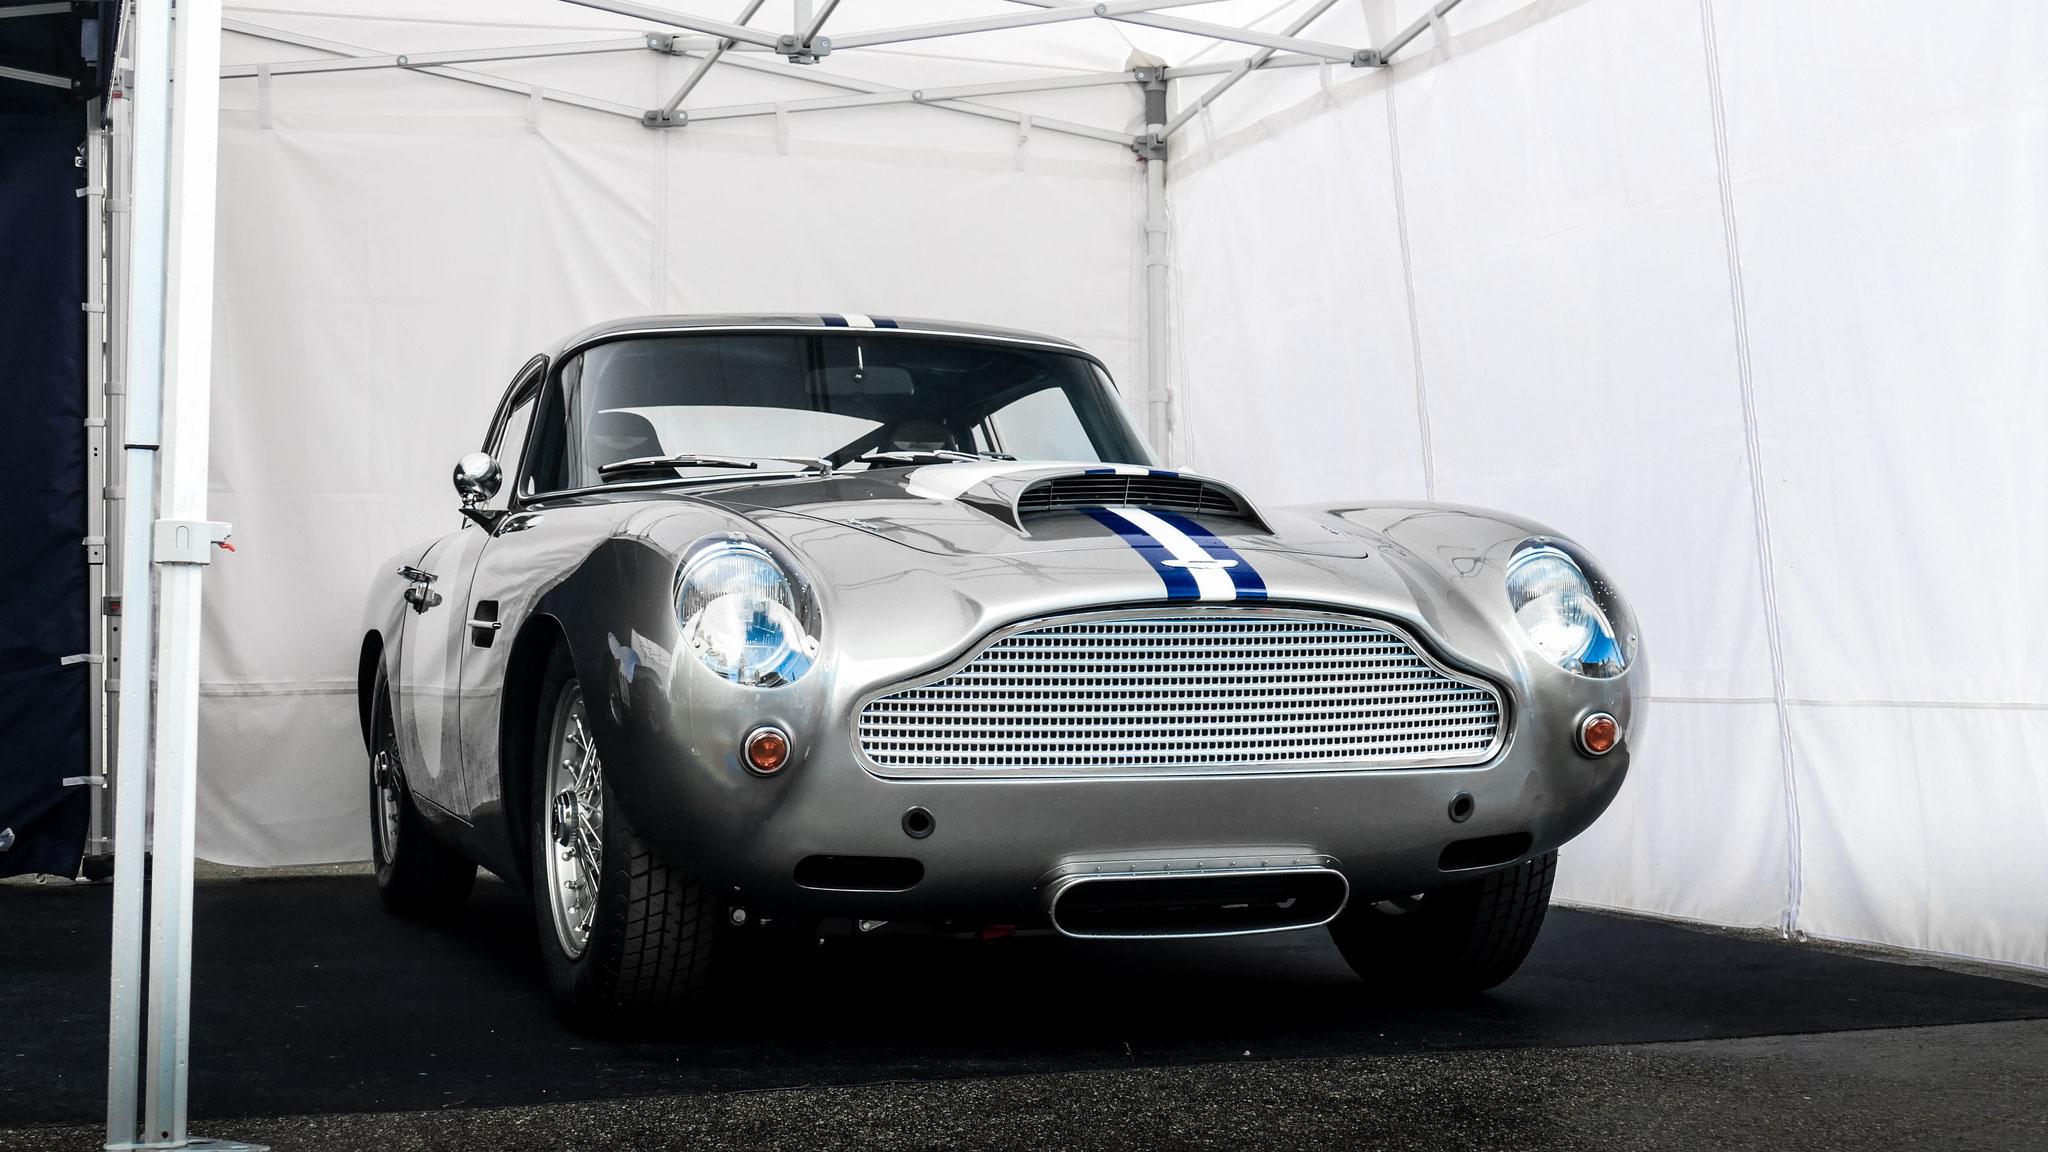 Aston Martin DB4 GT Superleggera Continuation